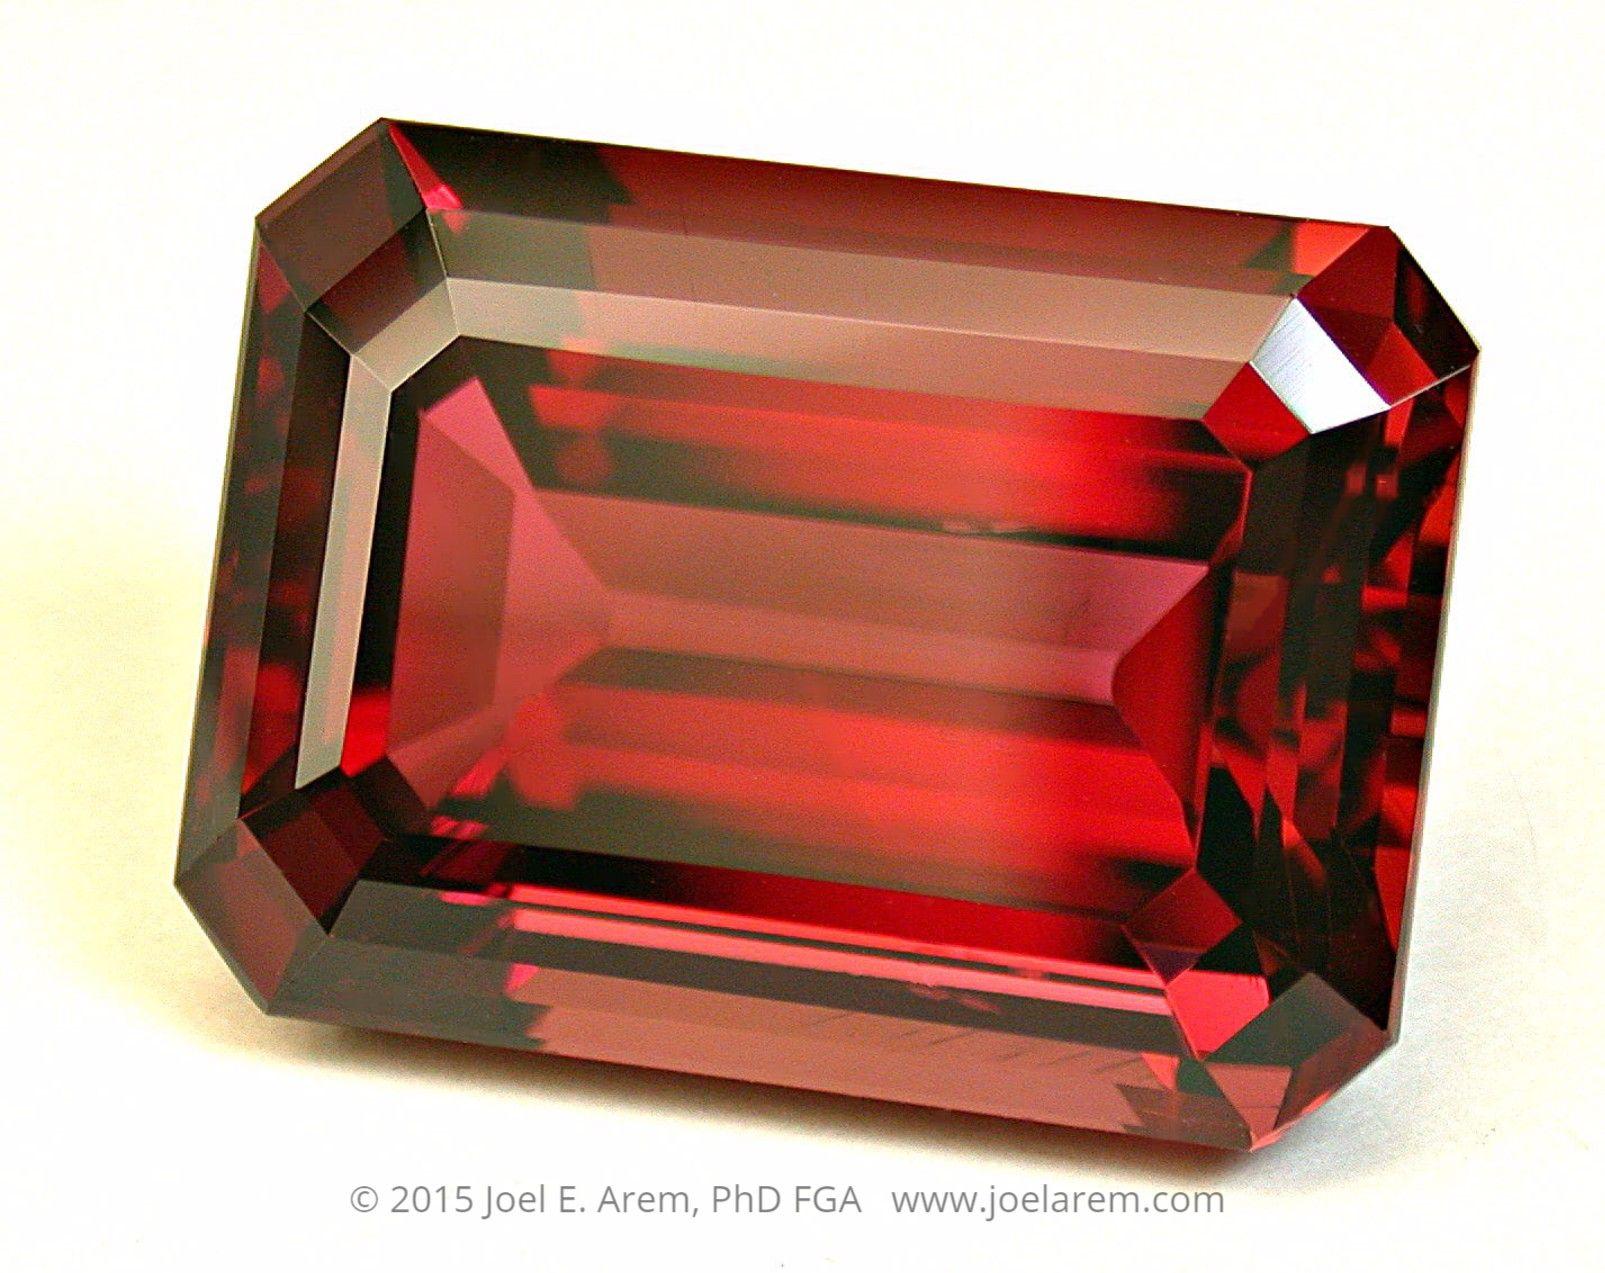 RUBELLITE TOURMALINE, 36.85 carats, in a unique and